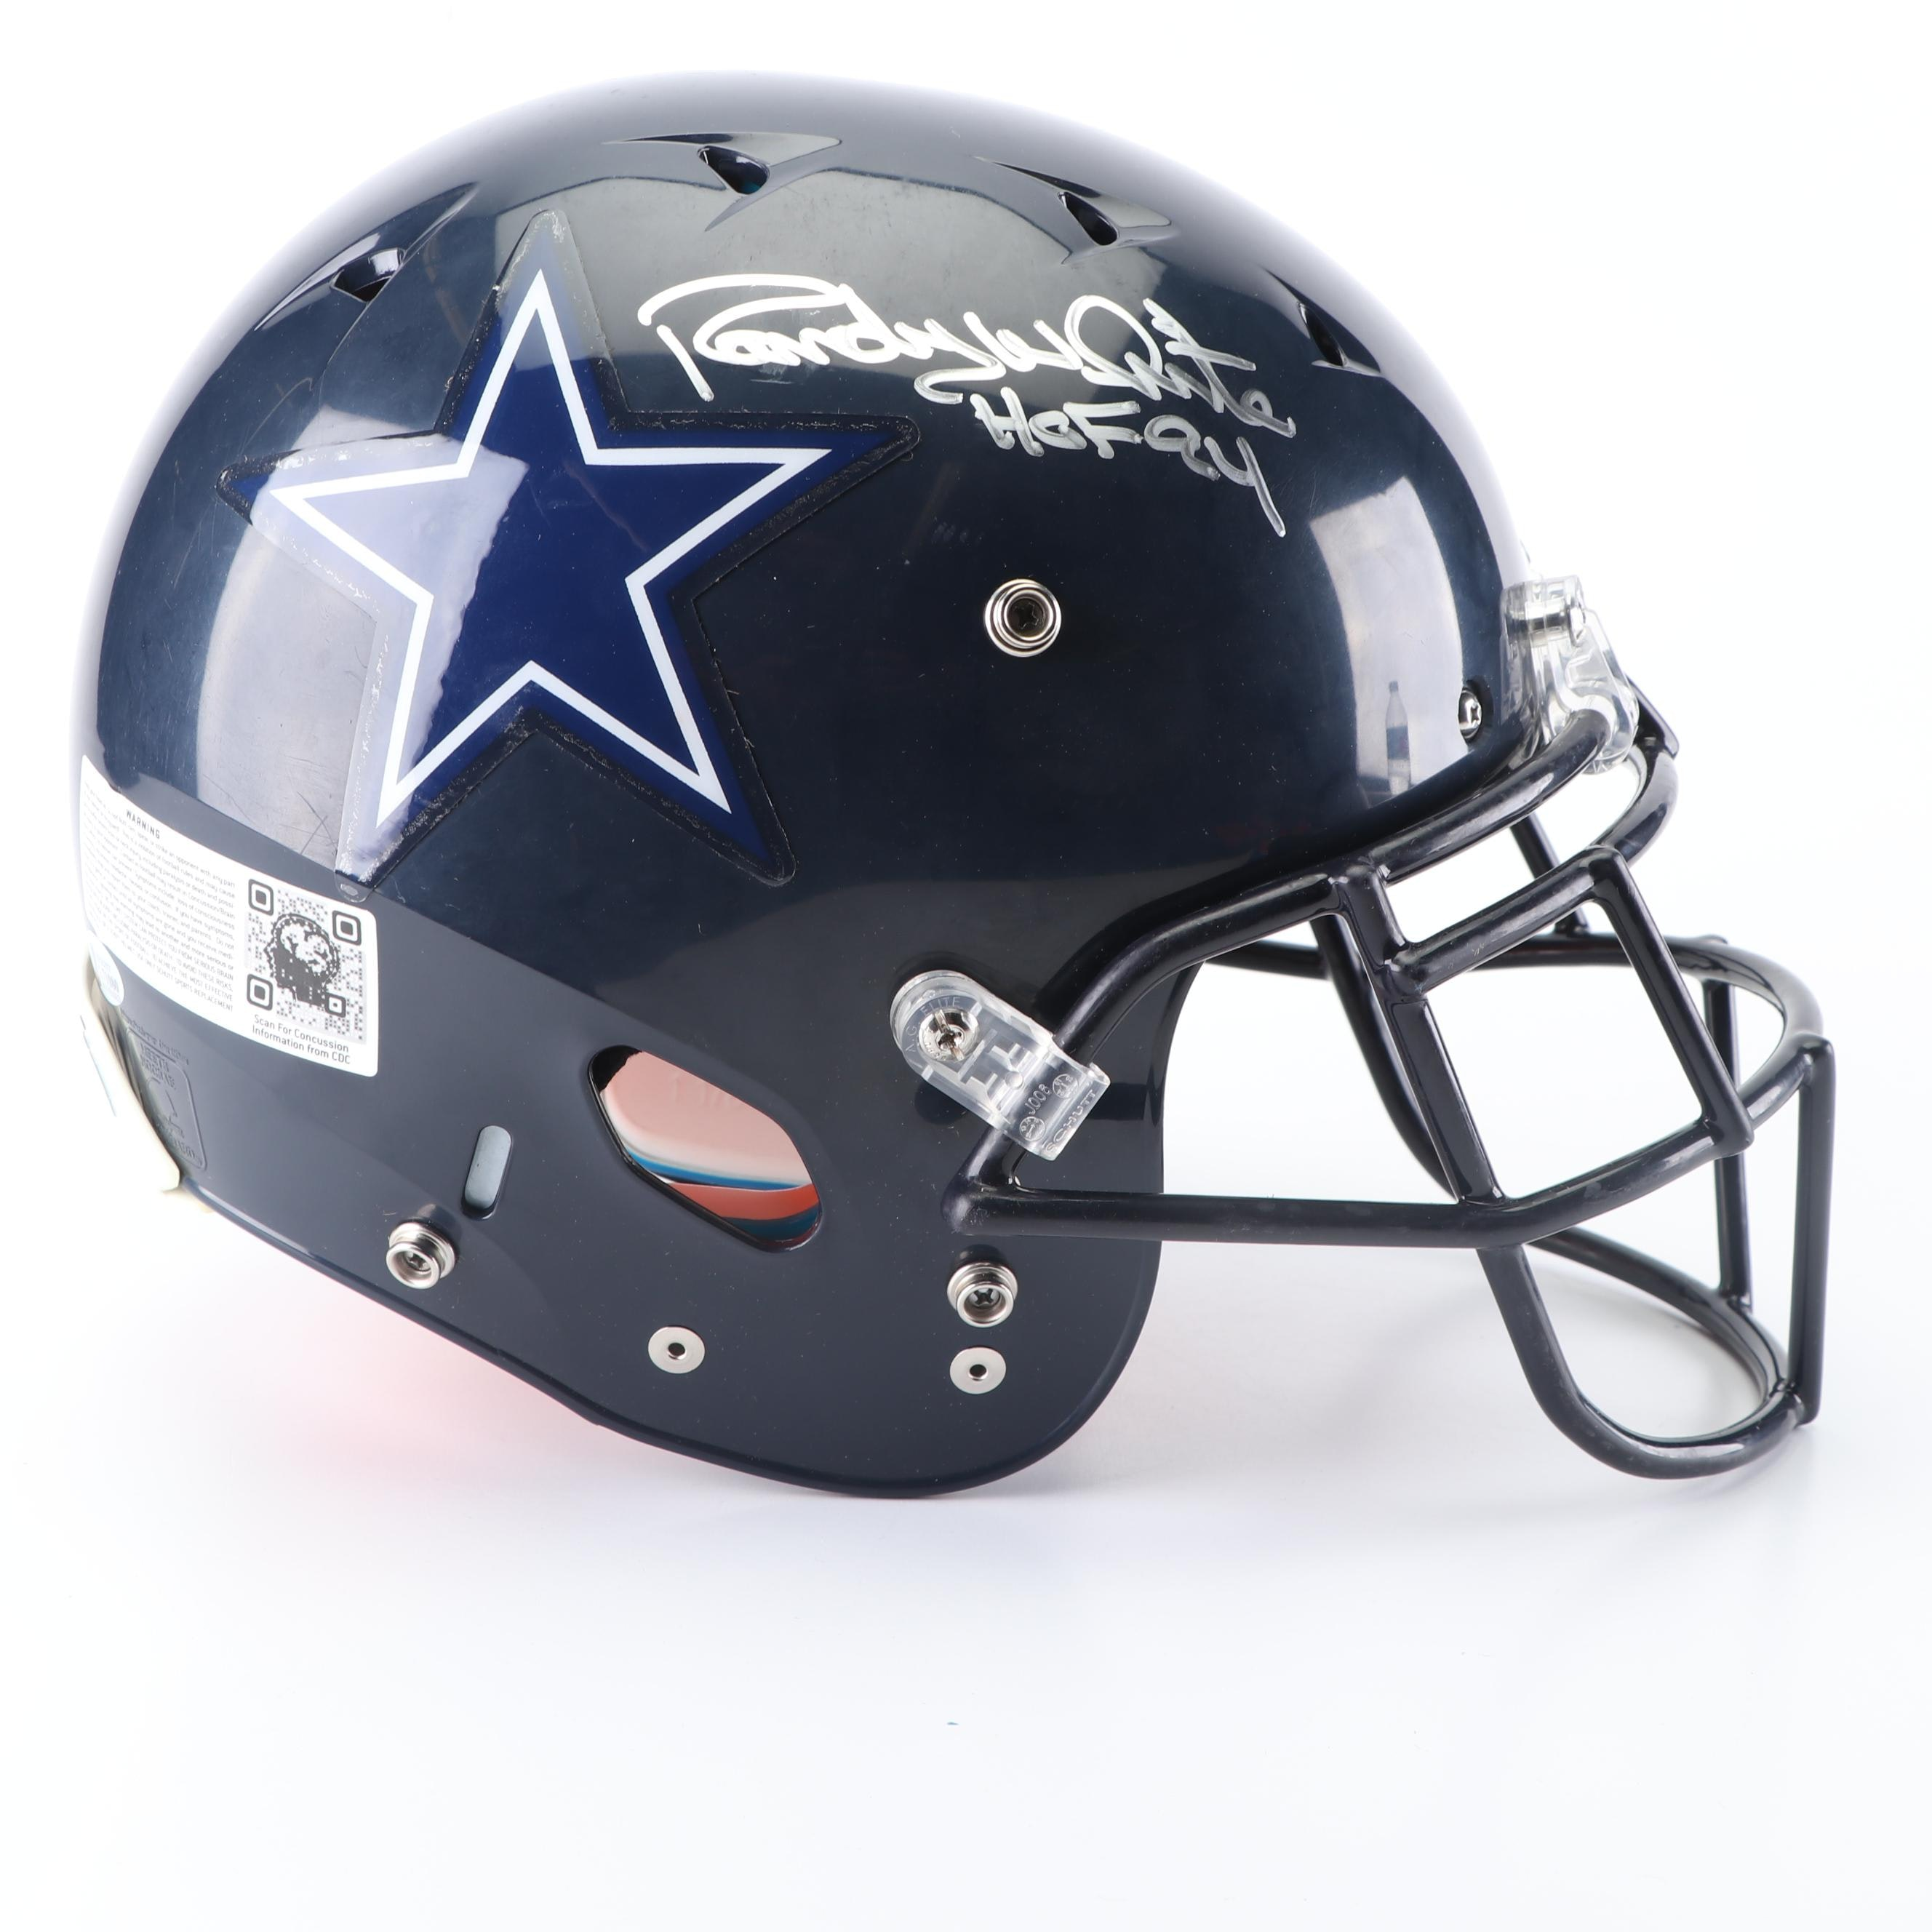 Randy White Autographed Dallas Cowboys Replica Full Size Helmet - Beckett COA